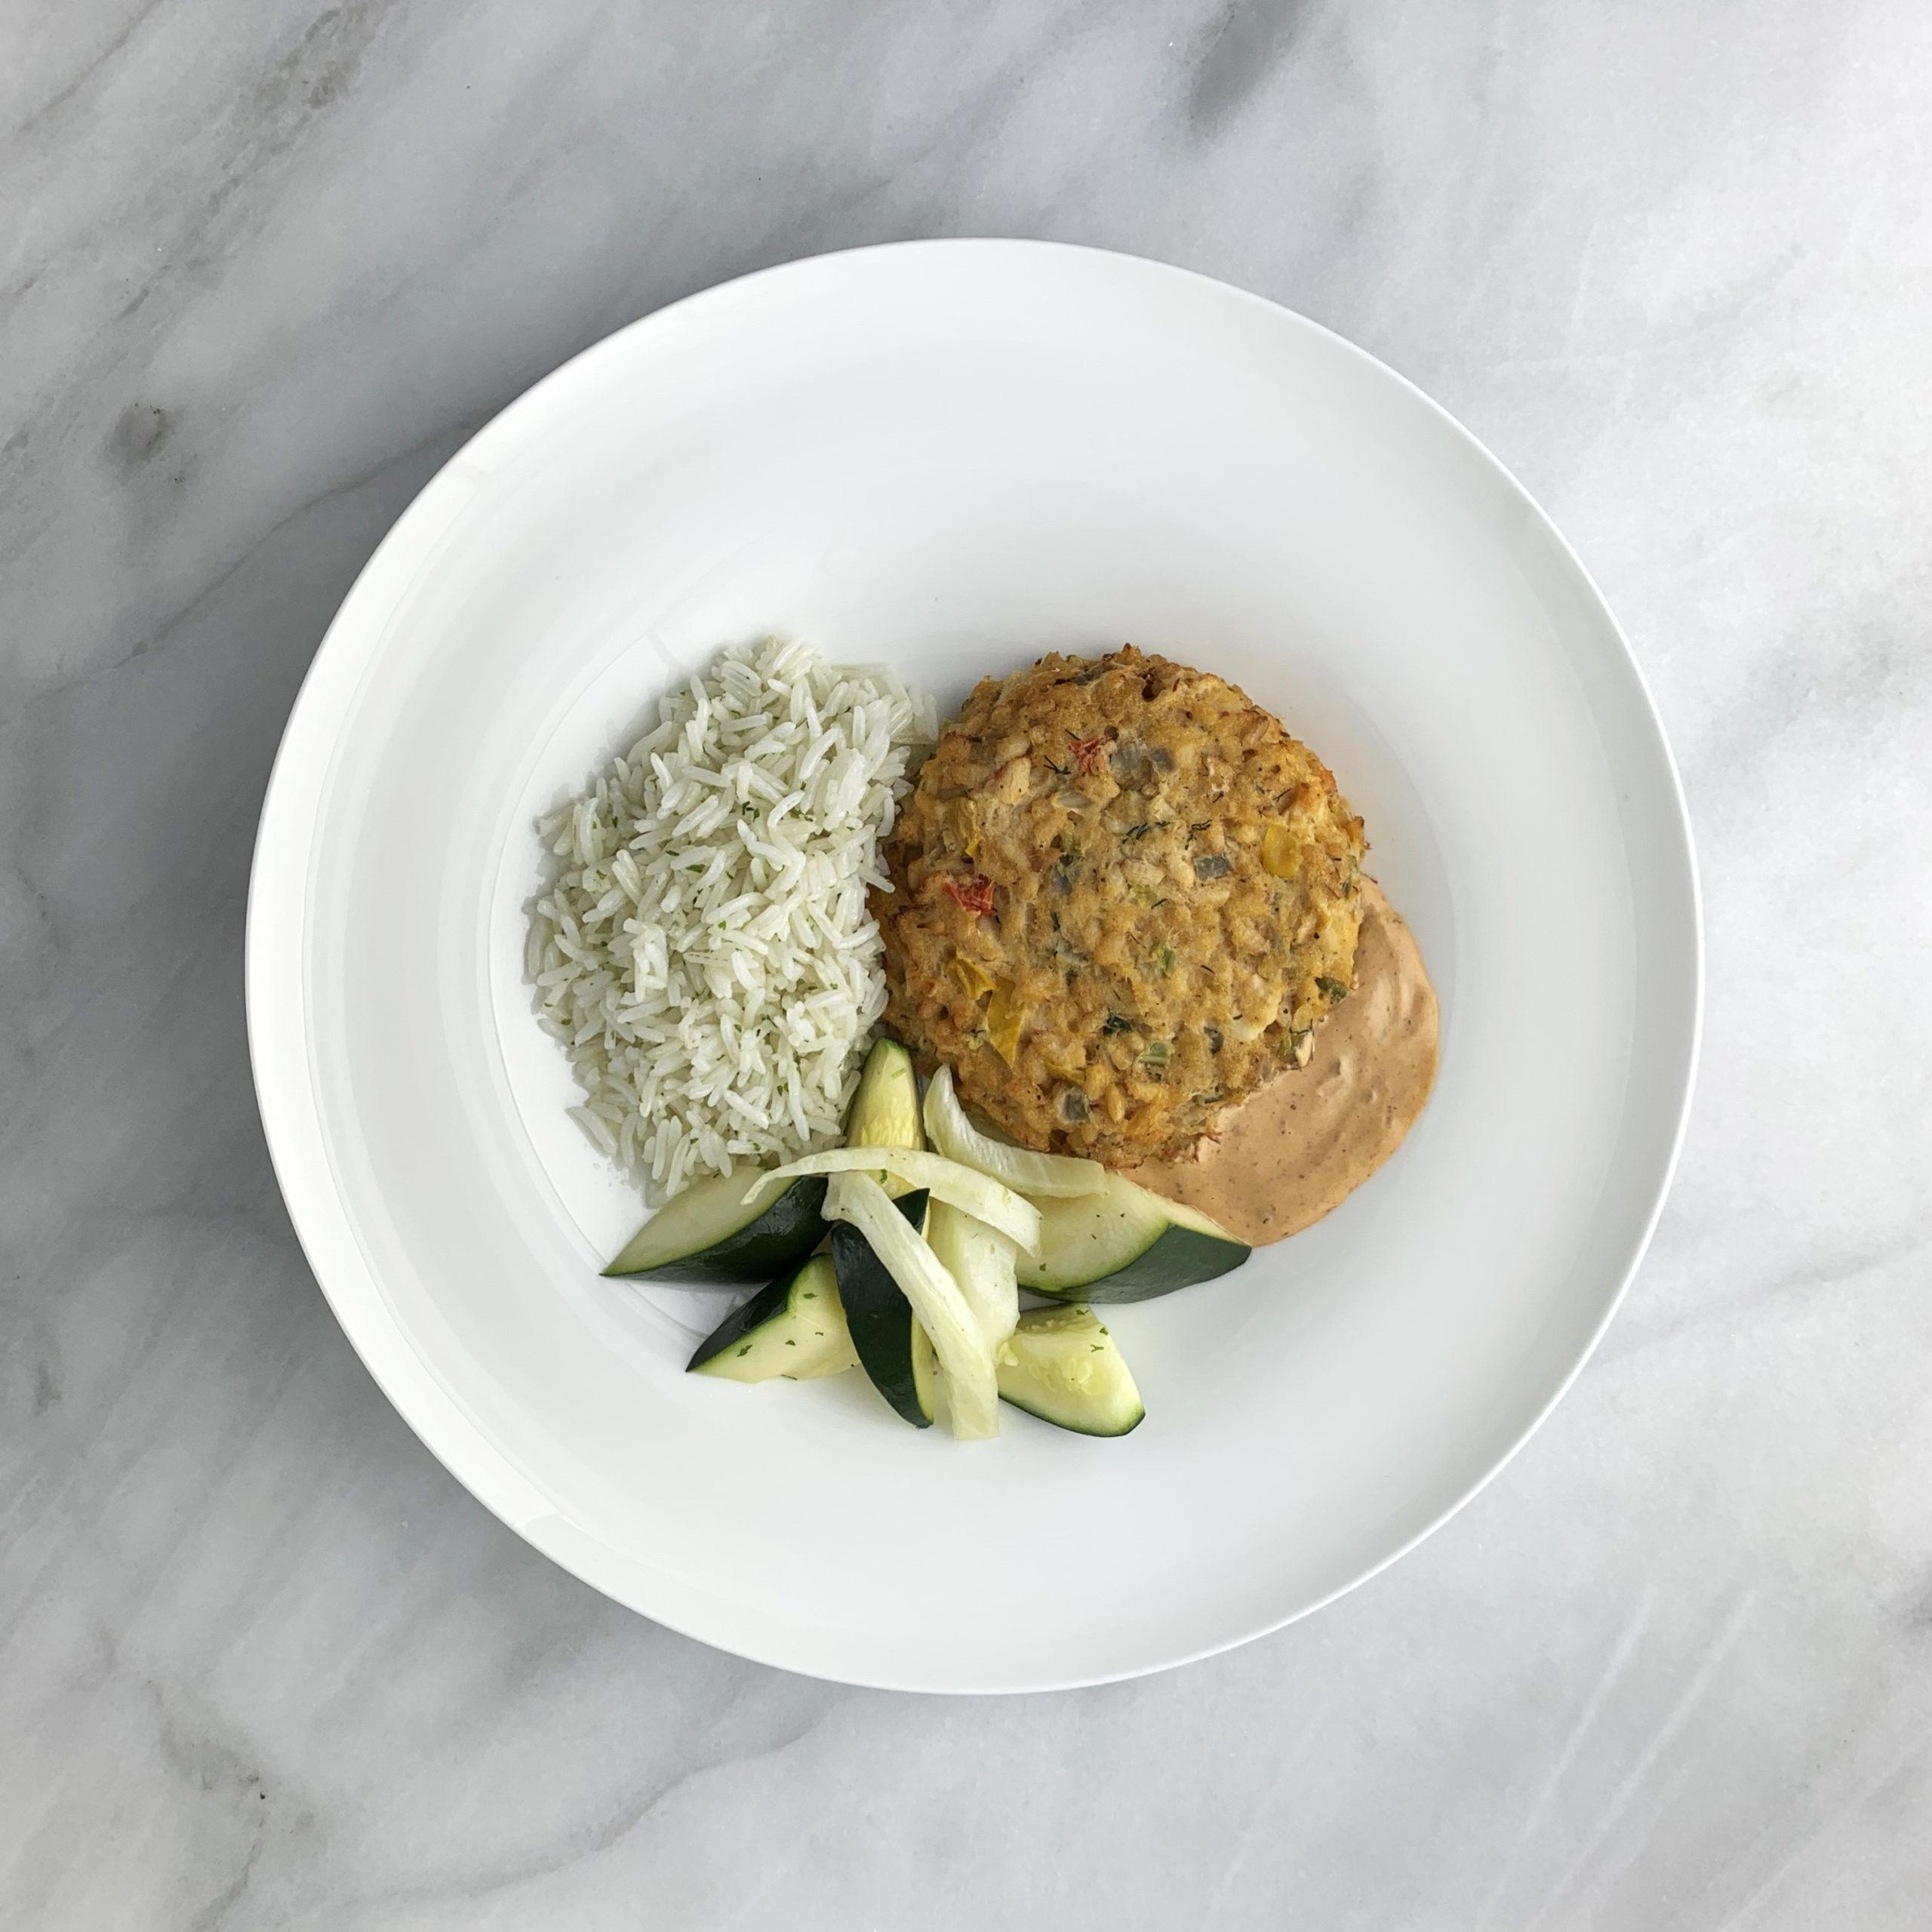 Fish Cake with Chipotle Aioli